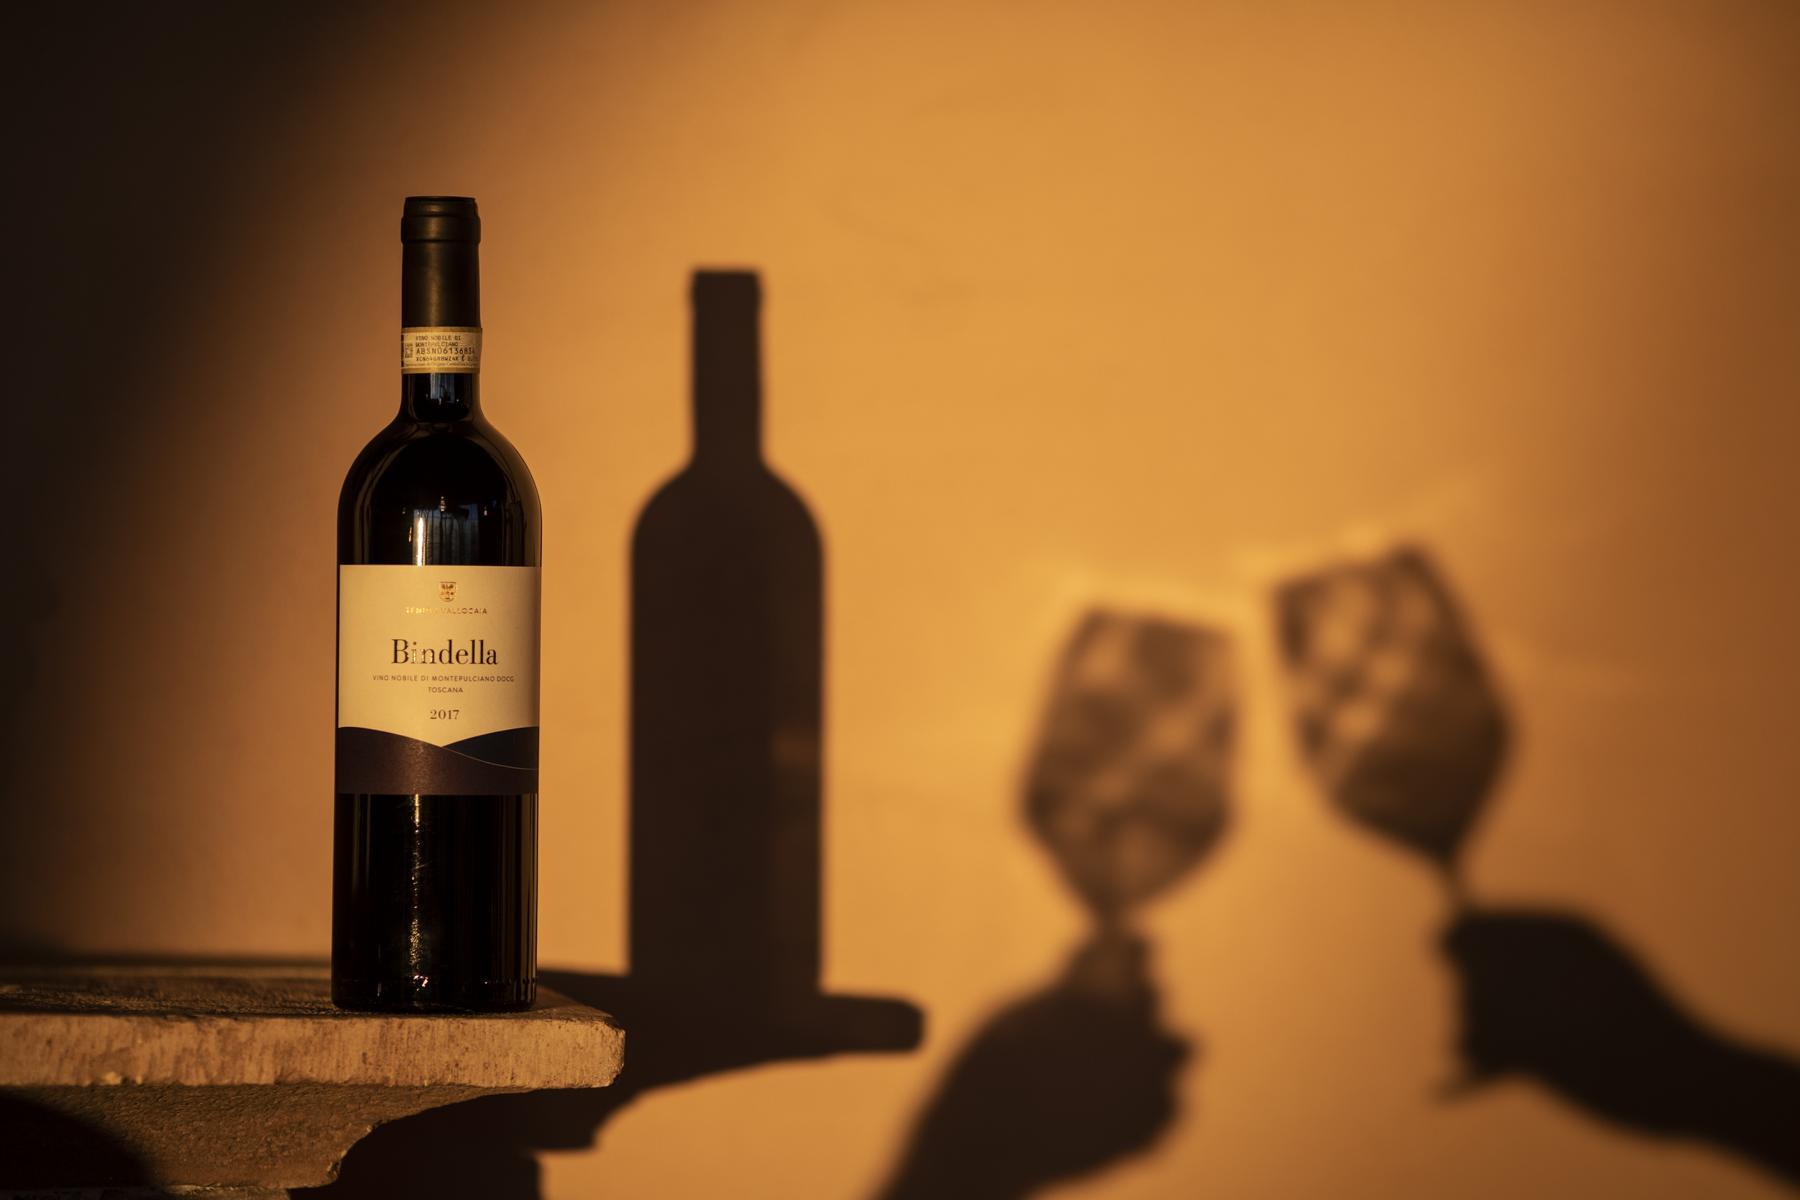 Vino Nobile di Montepulciano Bindella